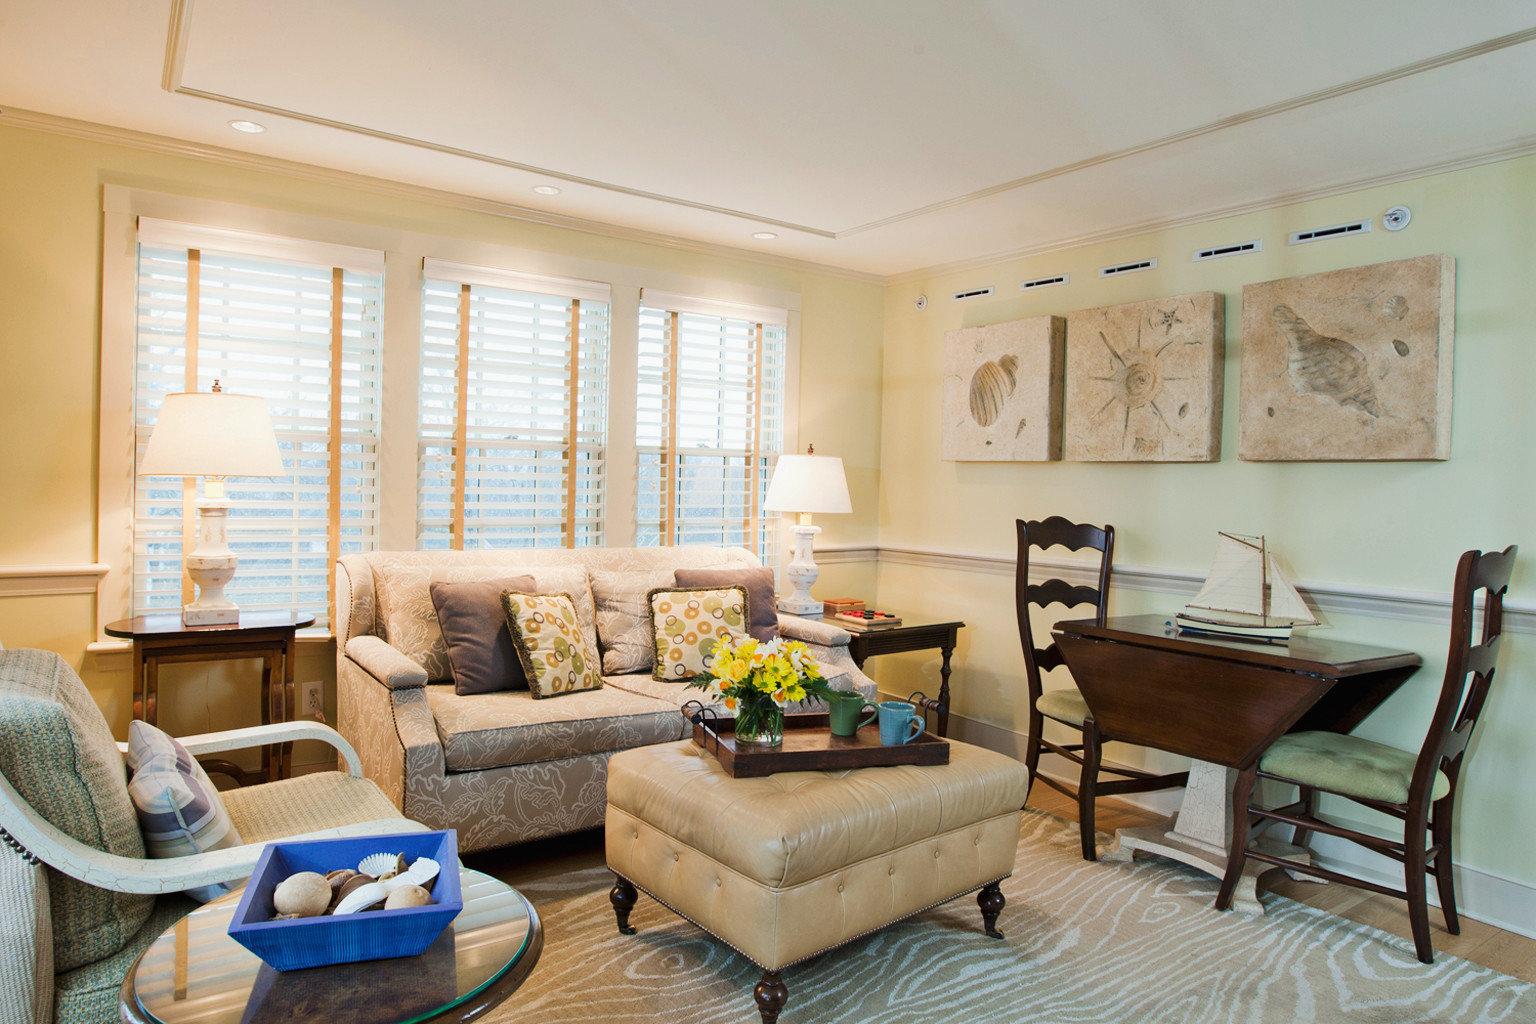 B&B Boutique Suite Waterfront sofa living room property home condominium hardwood cottage